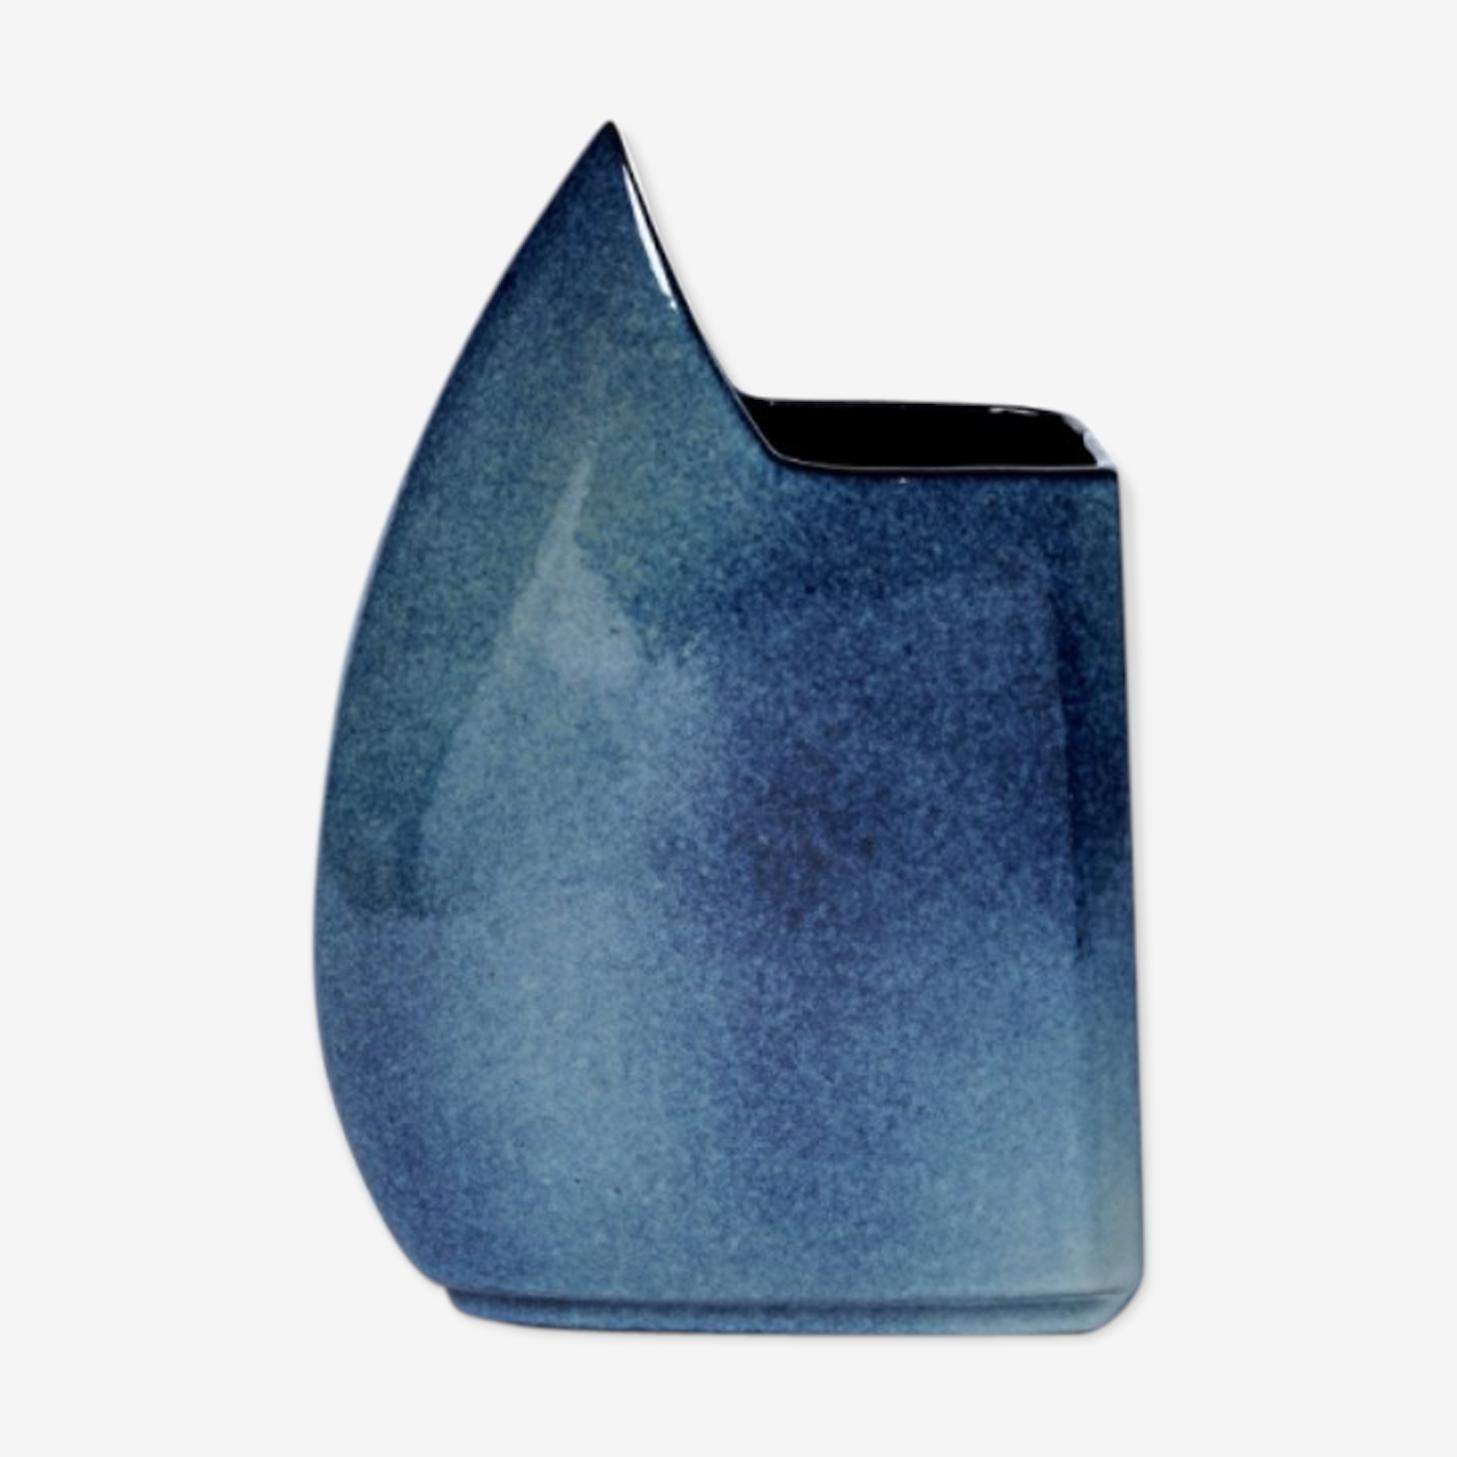 Vase moucheté bleu